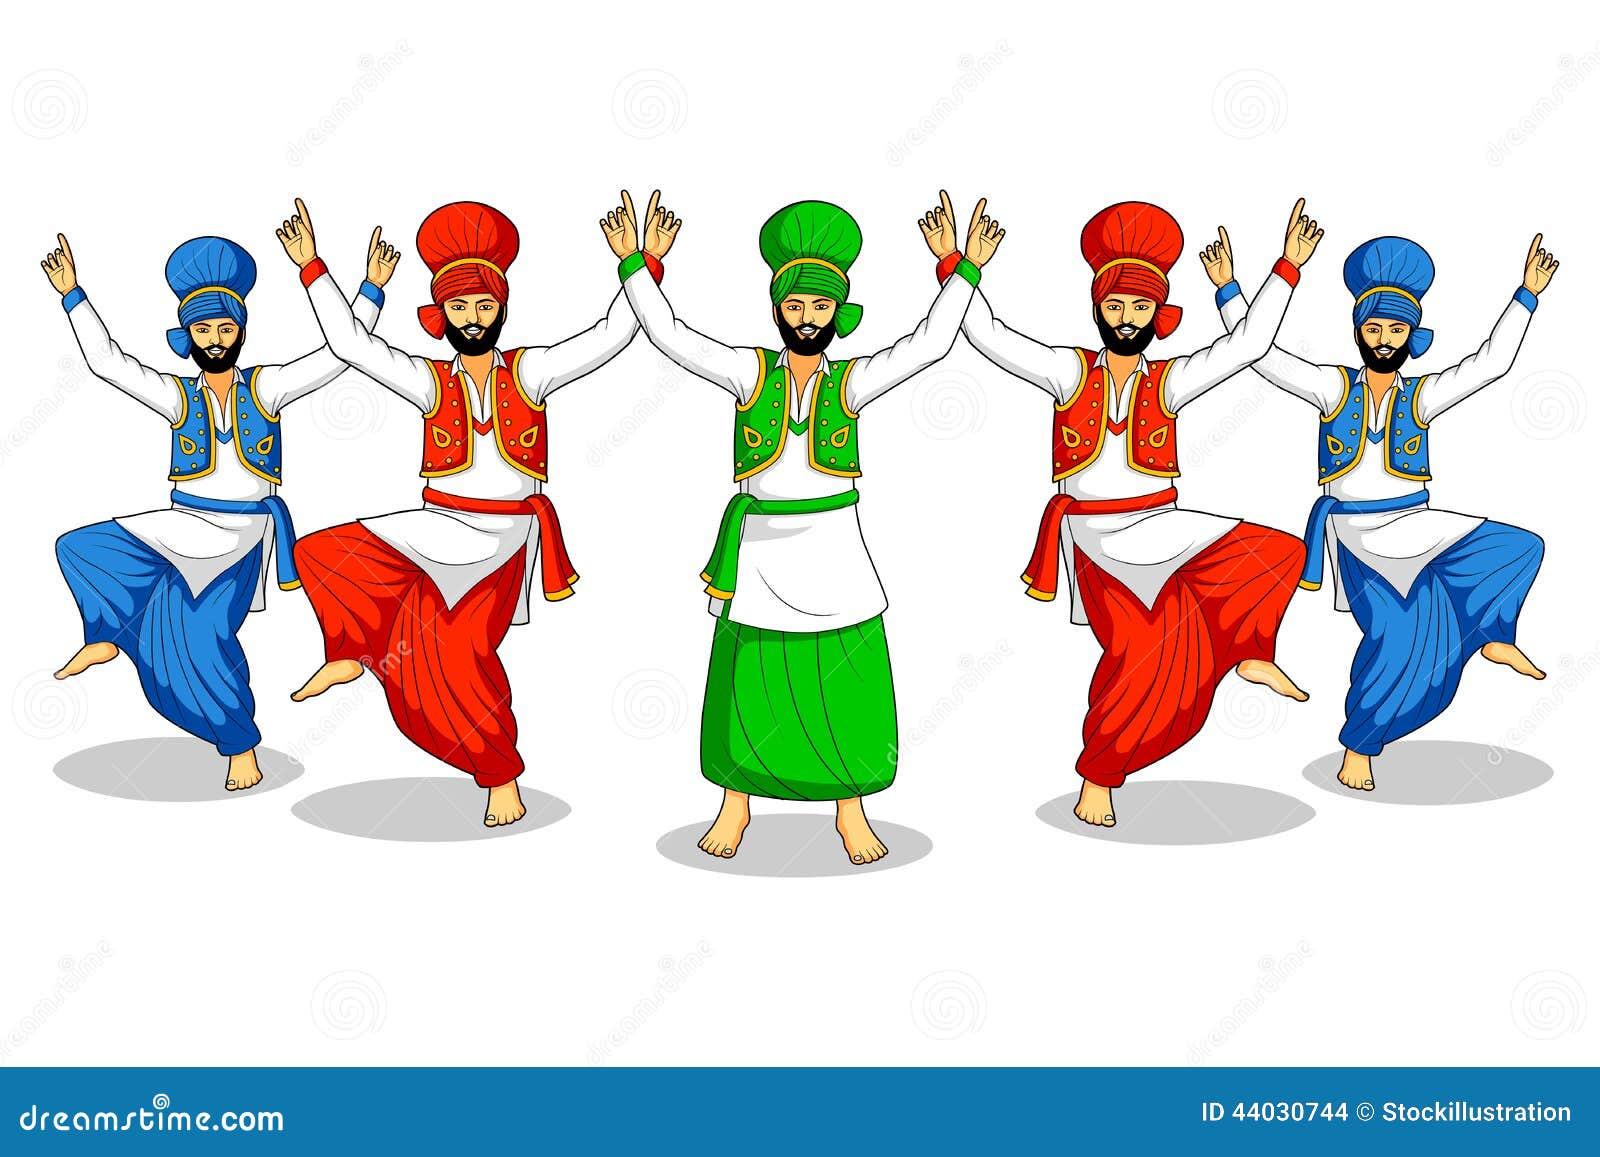 sikh doing bhangra stock vector illustration of amritsar 44030744 aqua zumba logo vector logo zumba vectorizado gratis